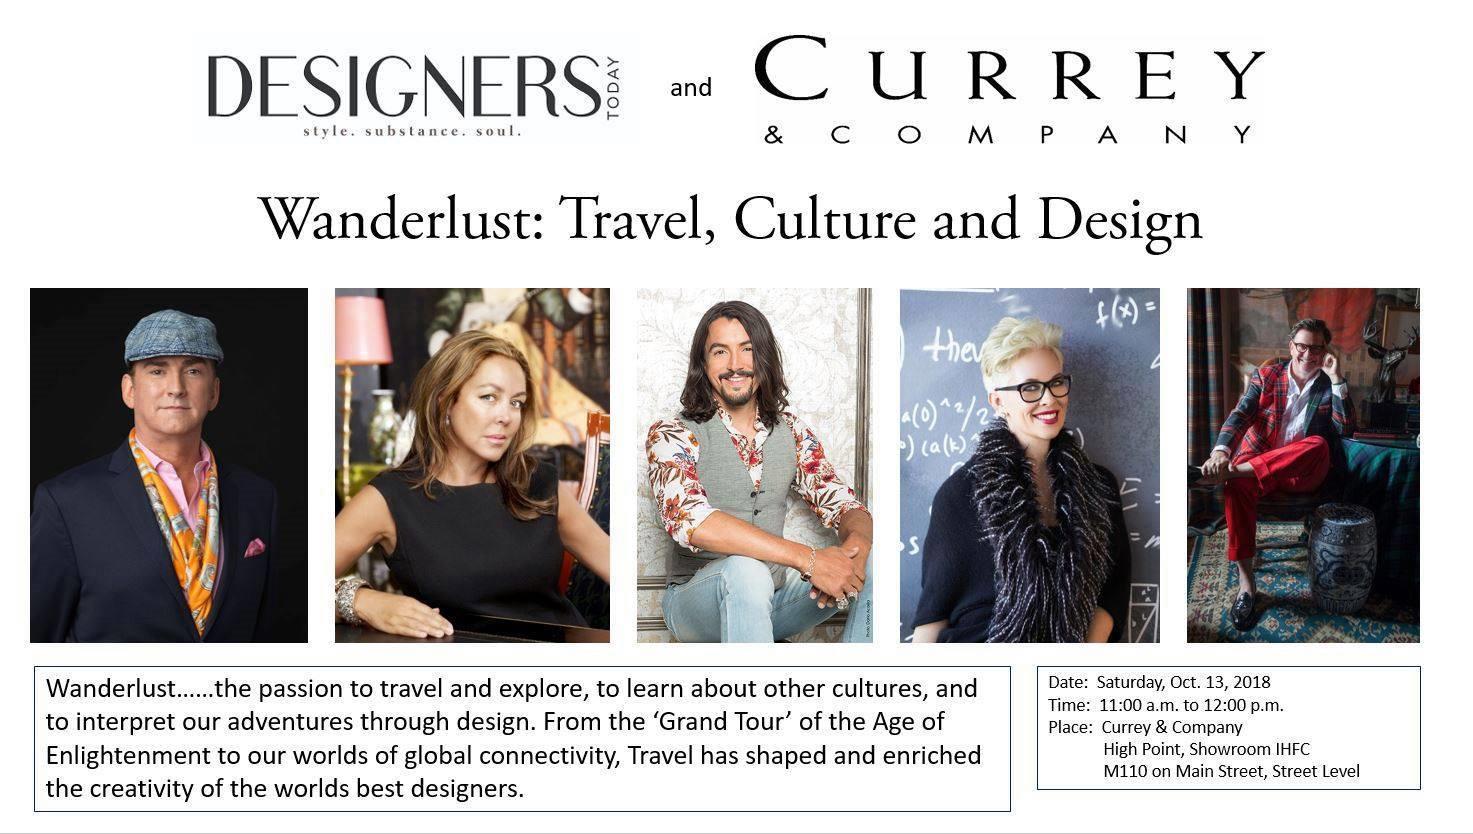 WANDERLUST: Travel, Culture and Design